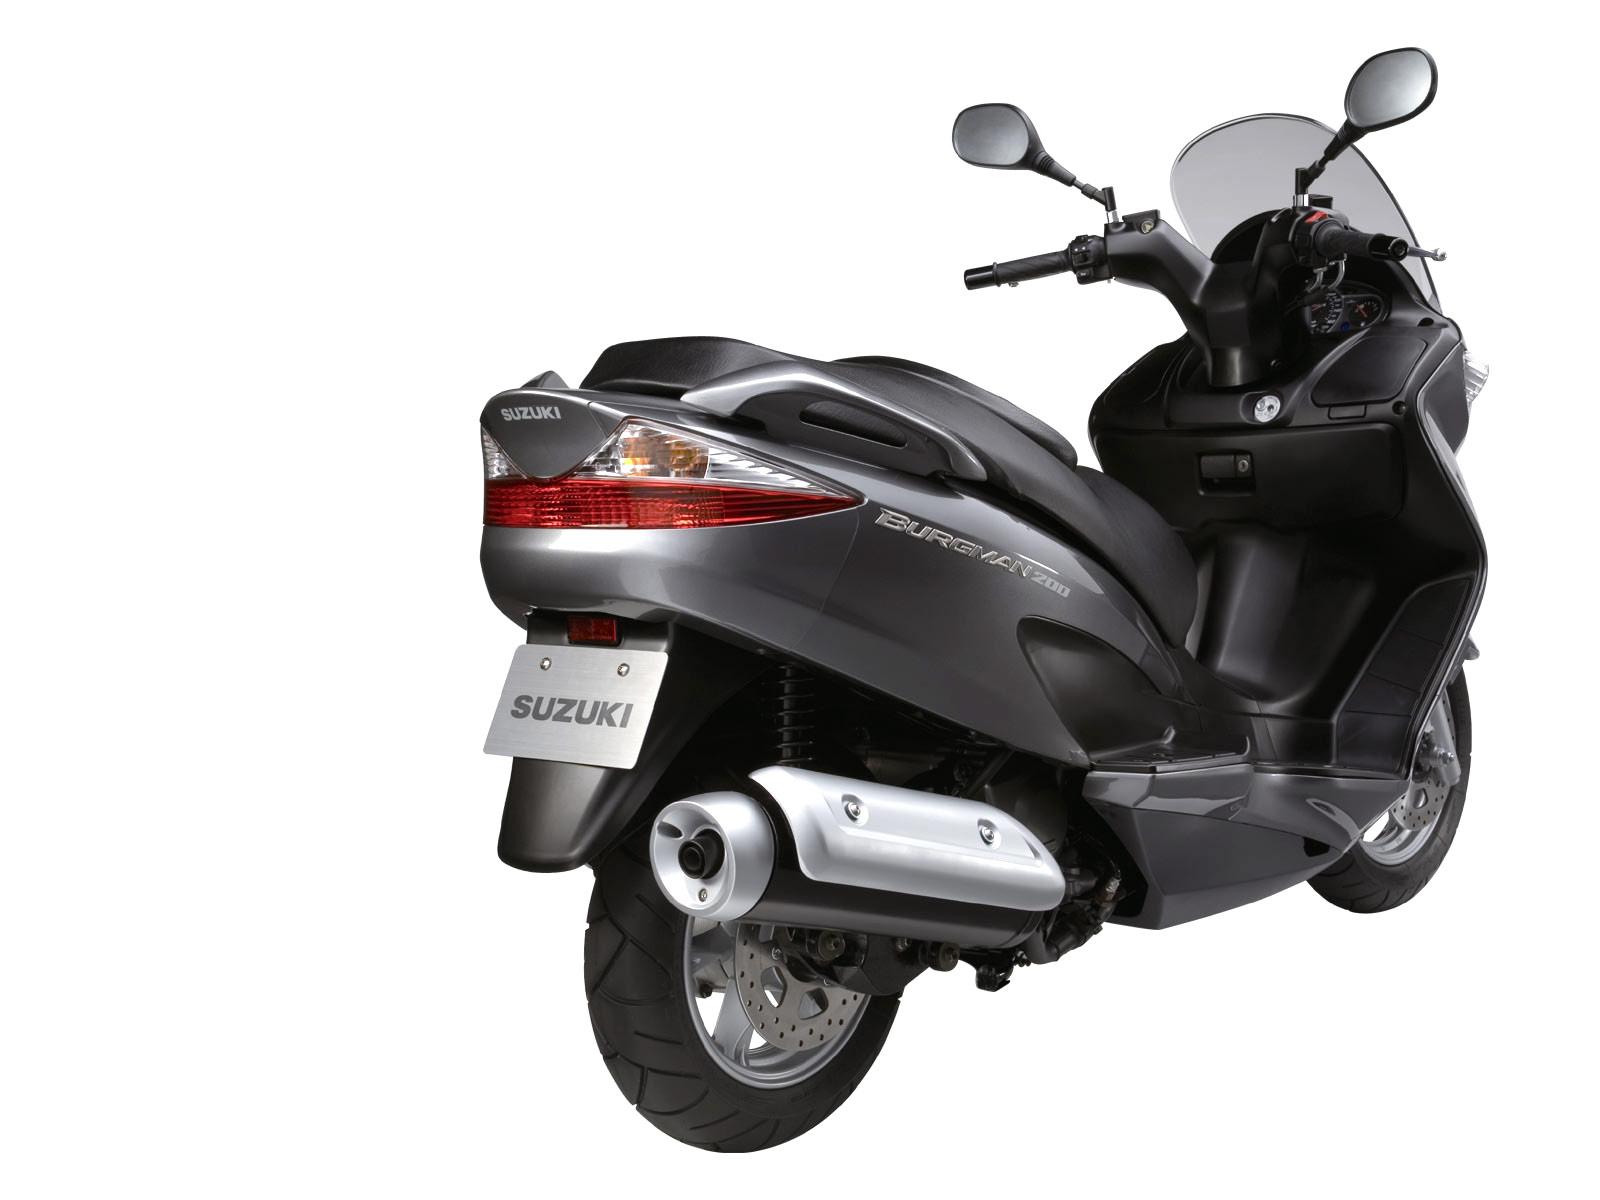 2007 Suzuki An Burgman 125 Scooter Pictures Specifications